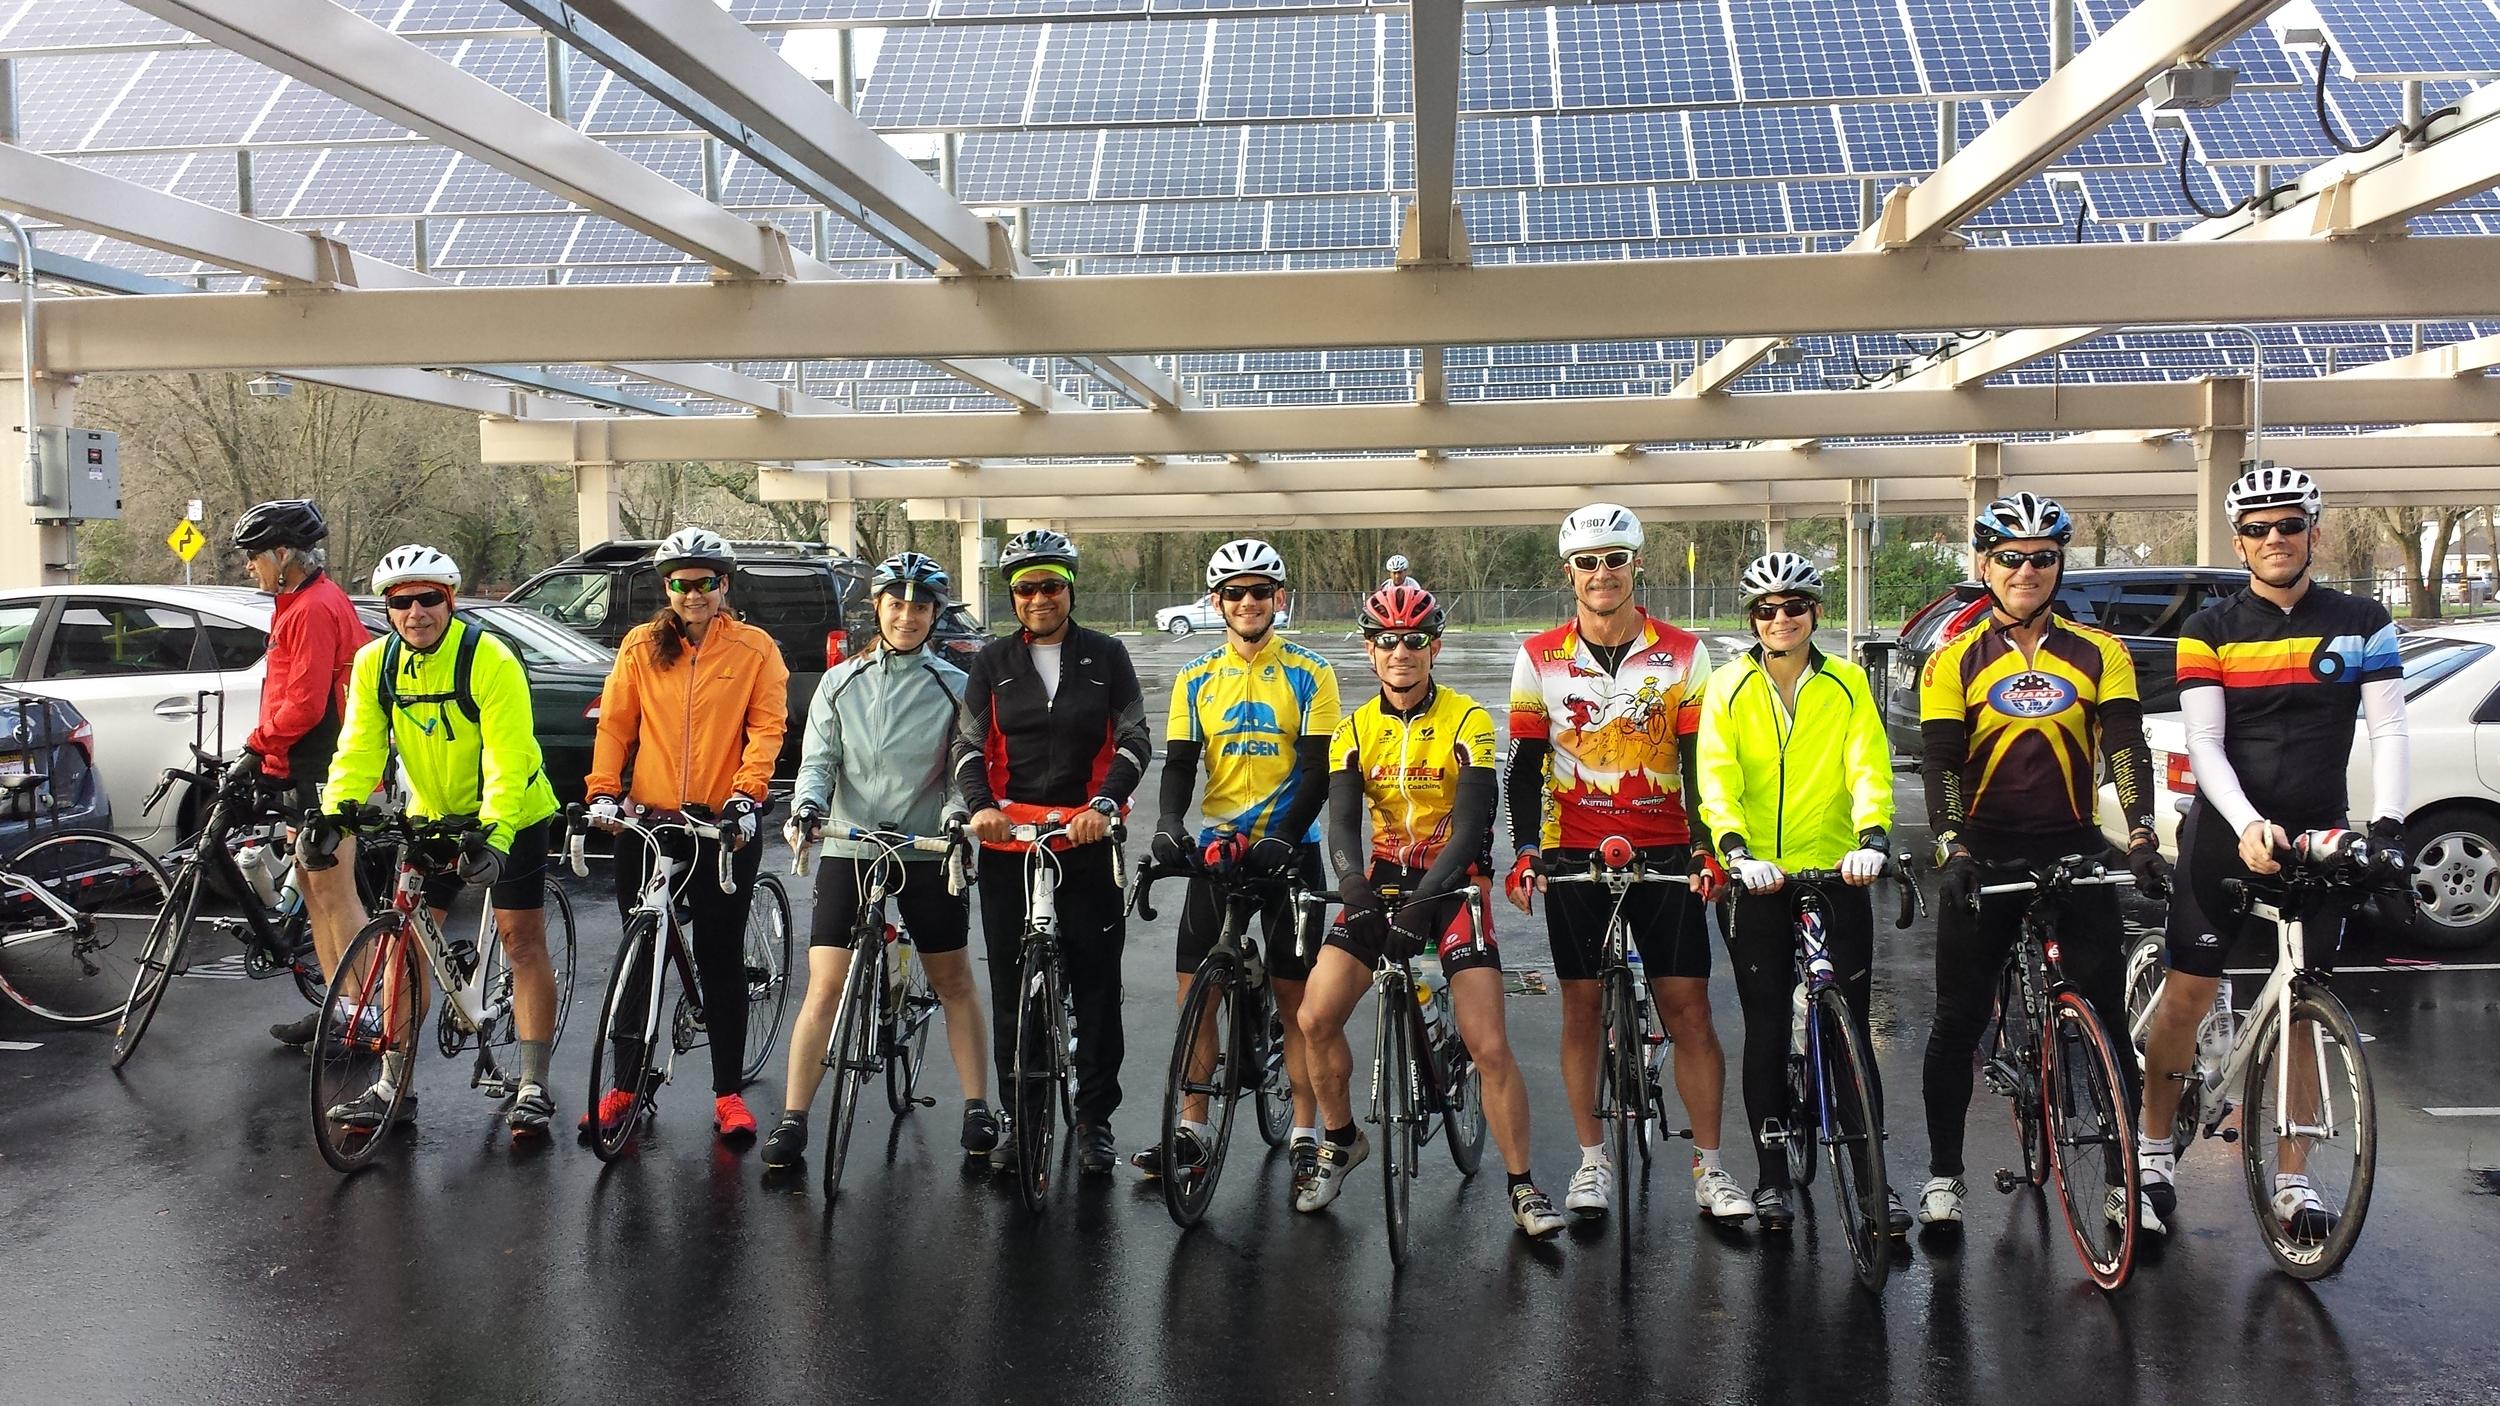 2-7-2015 Group Ride Danville.jpg